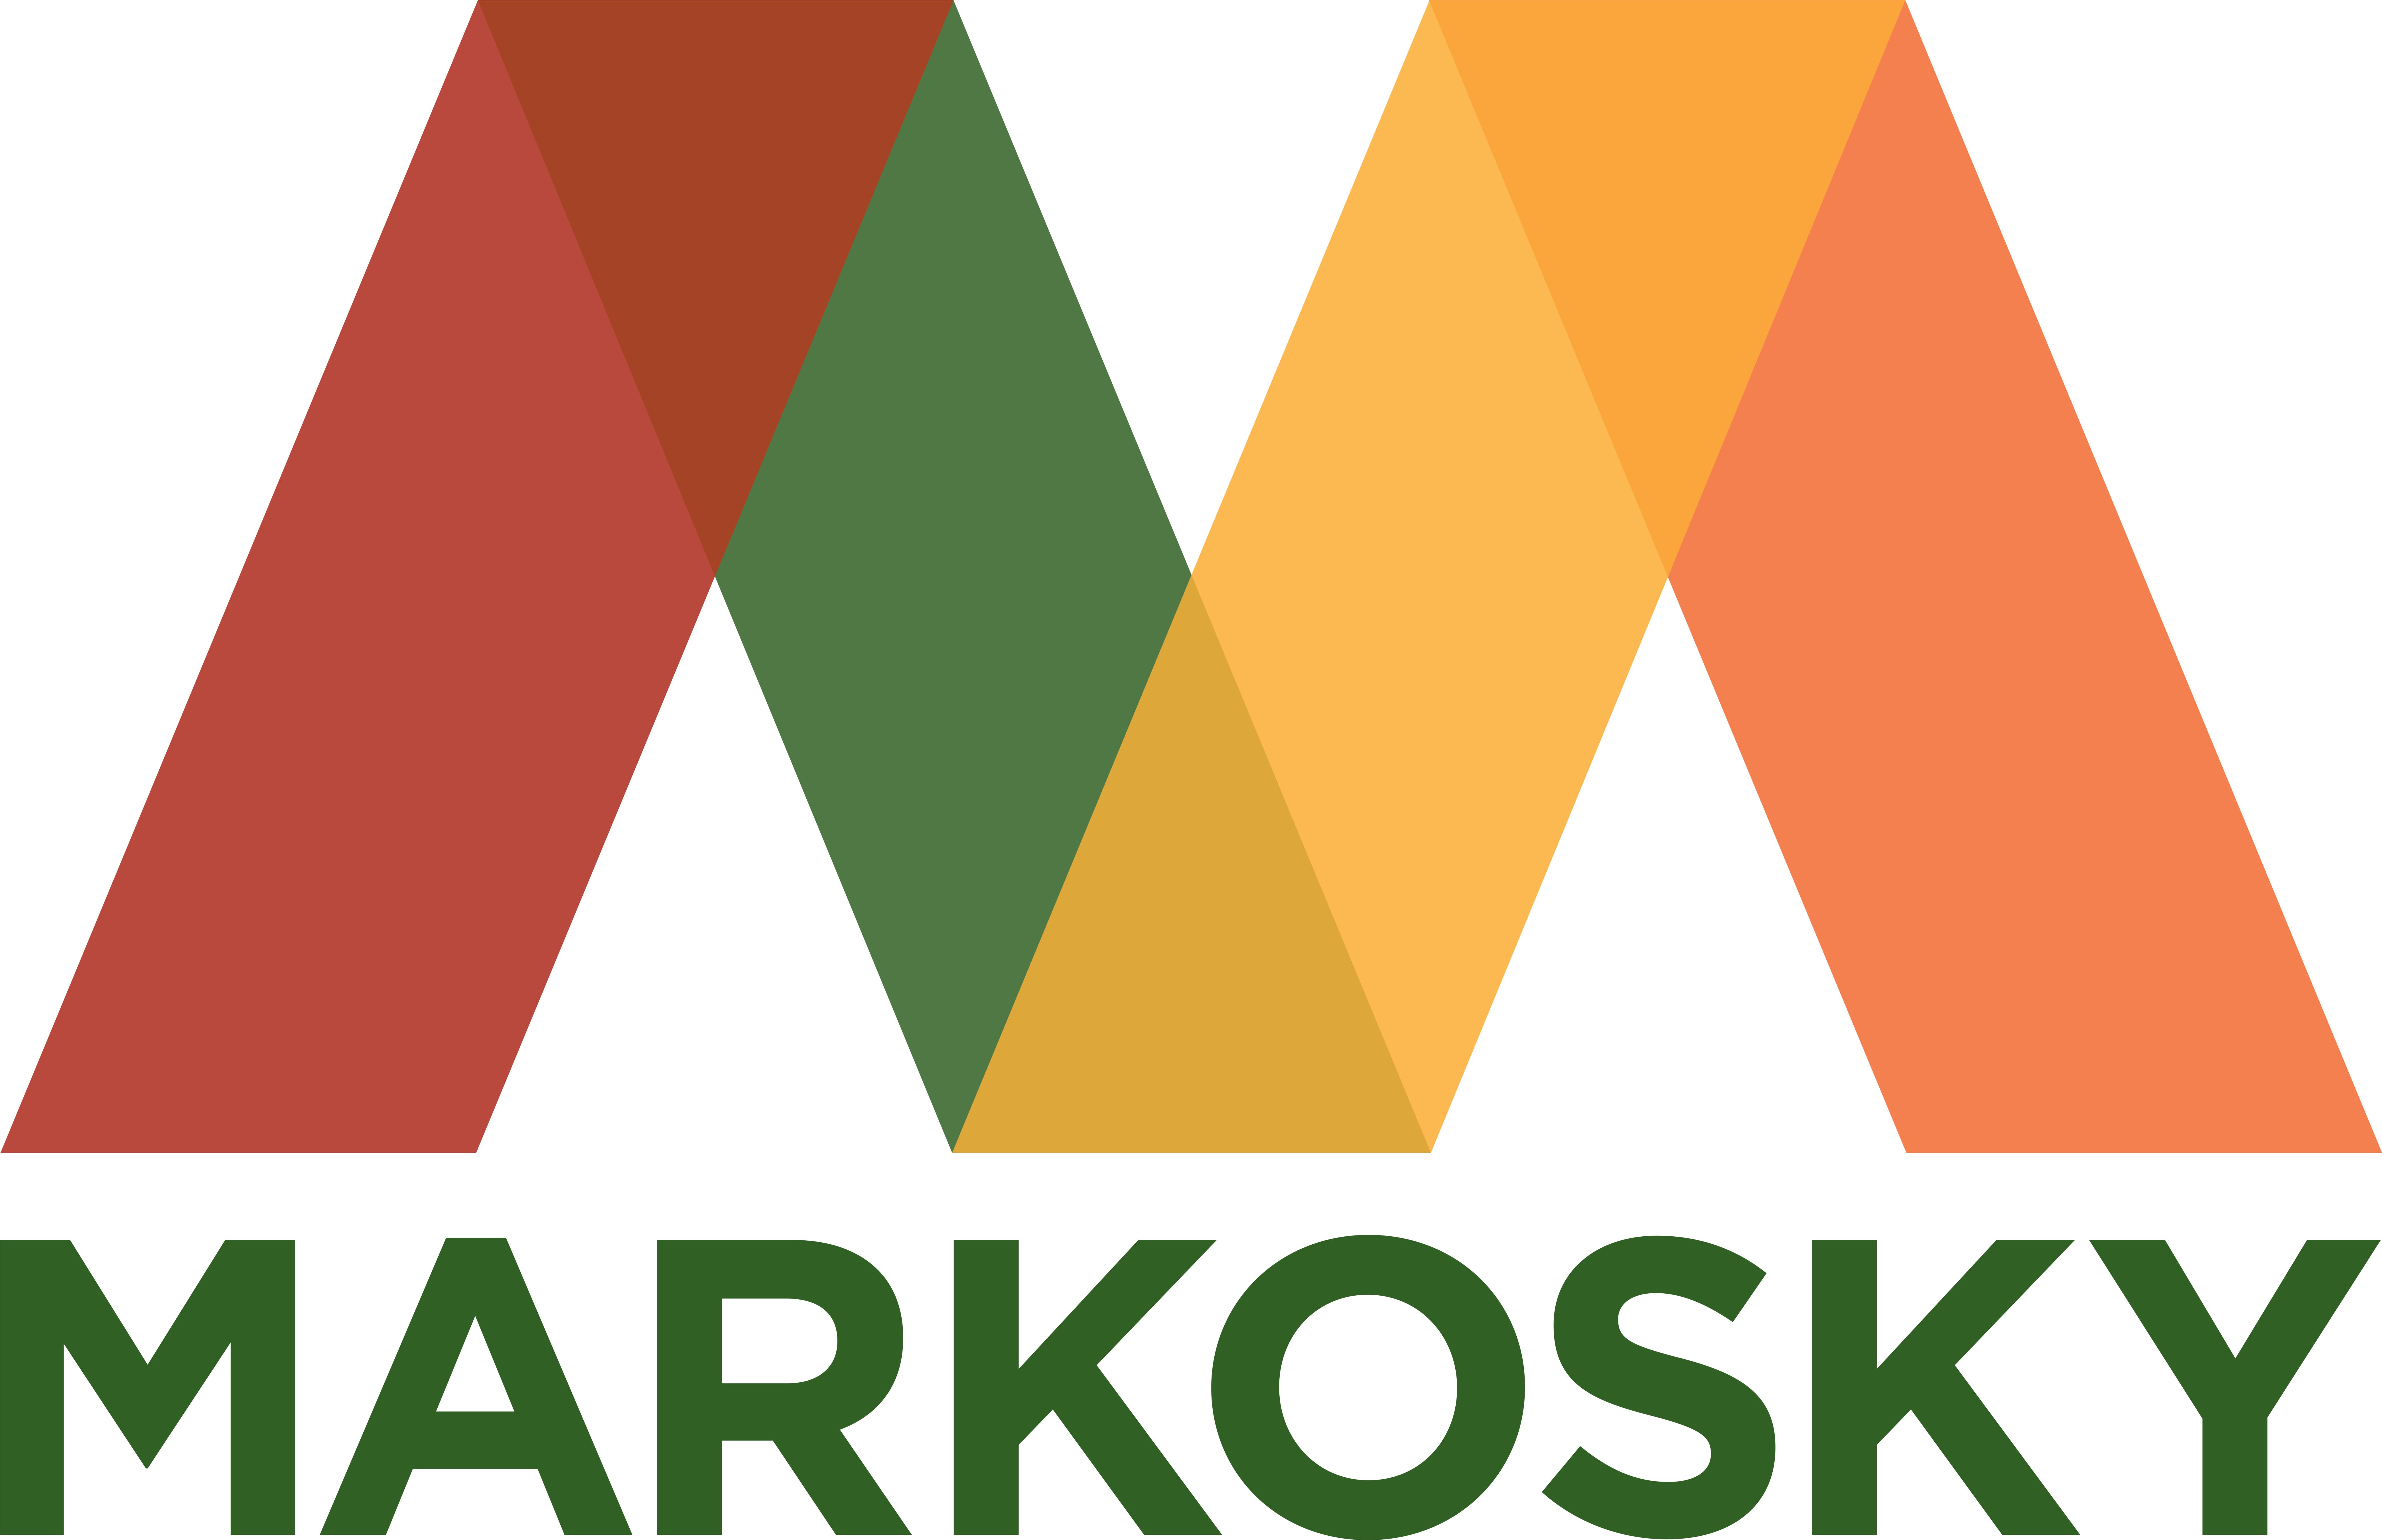 The Markosky Engineering Group, Inc. logo